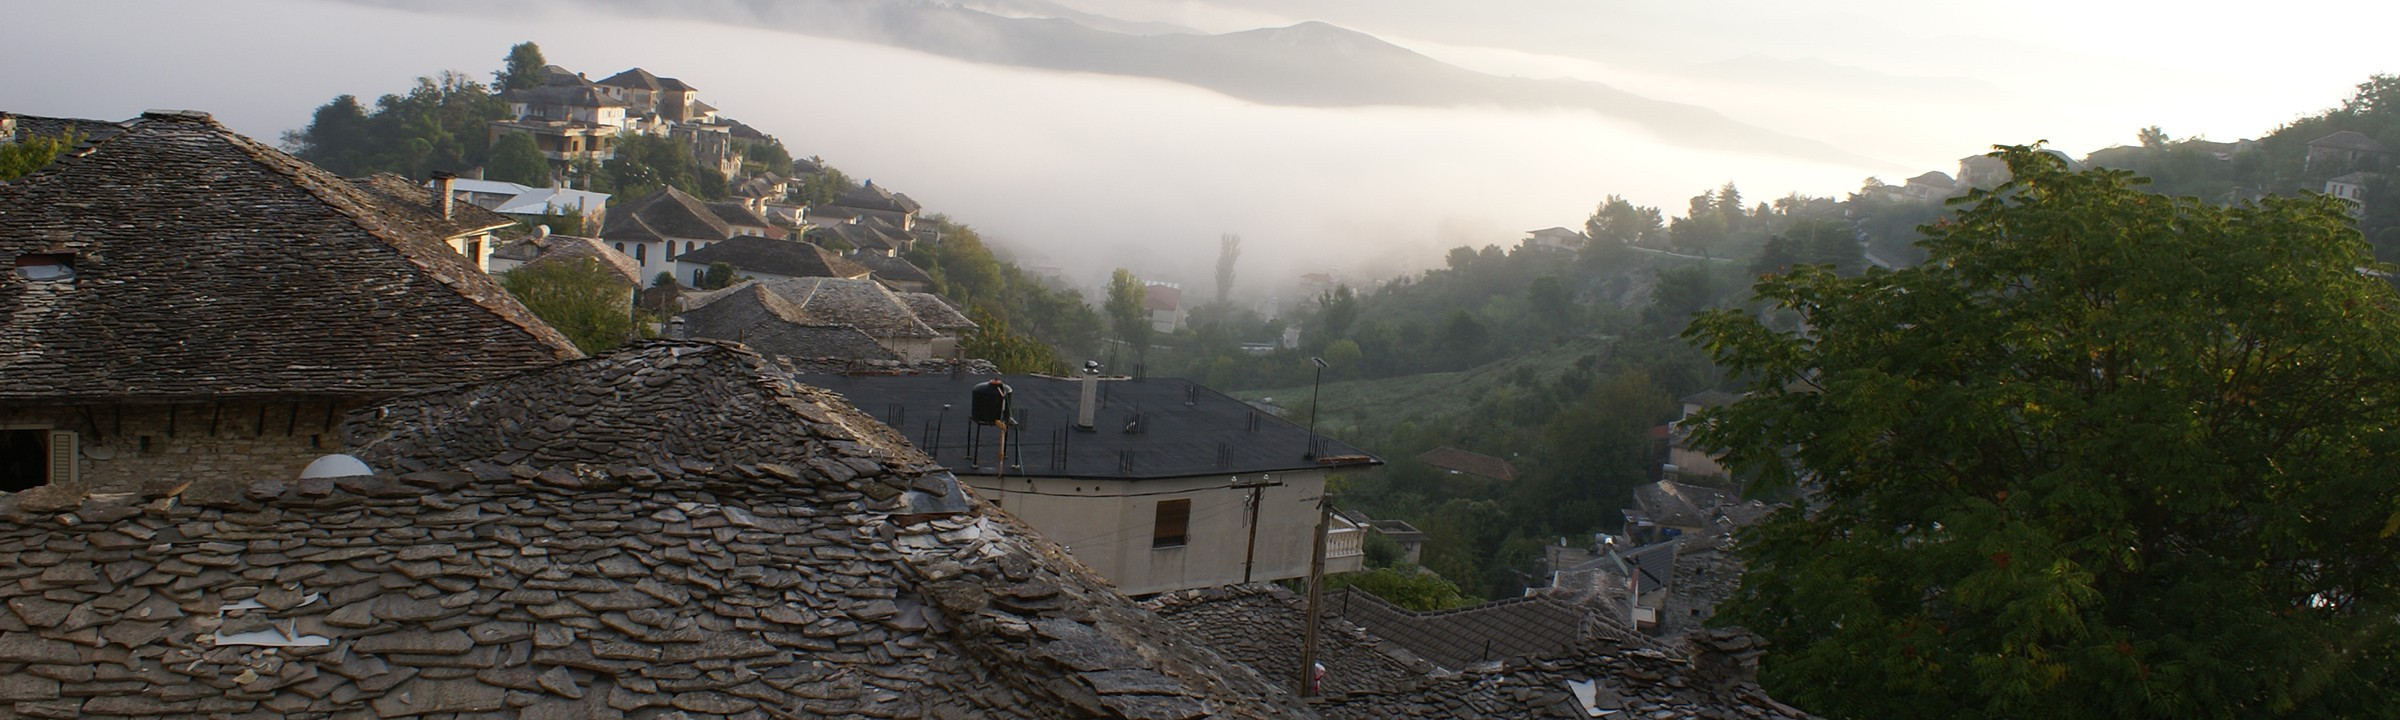 Mornings are magic in Gjirokastra